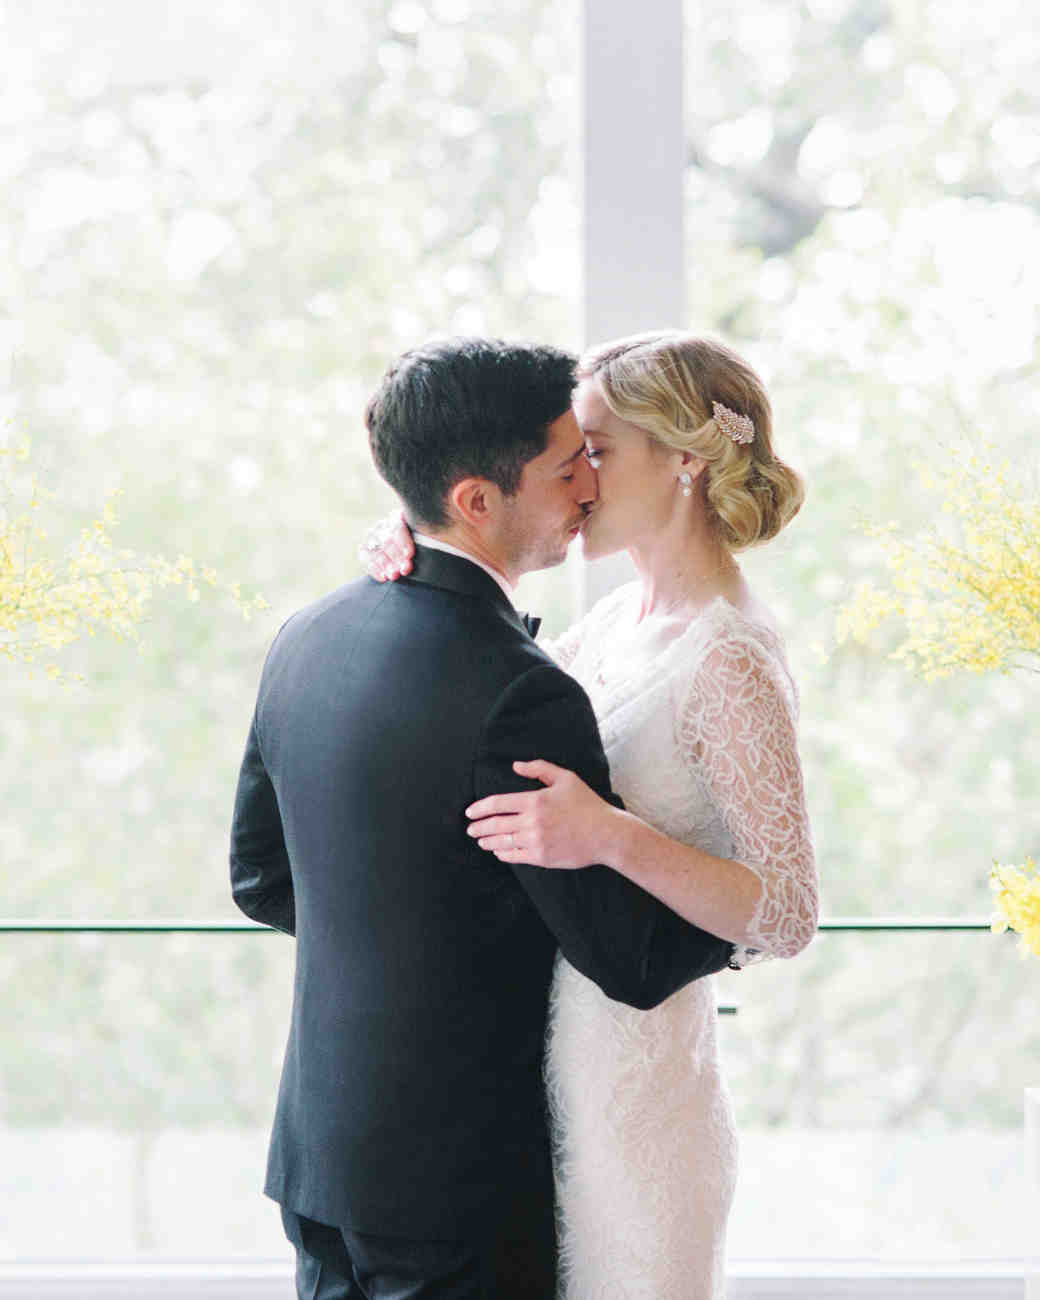 mamy-dan-wedding-canada-ceremony-first-look-kiss-078-s112629.jpg